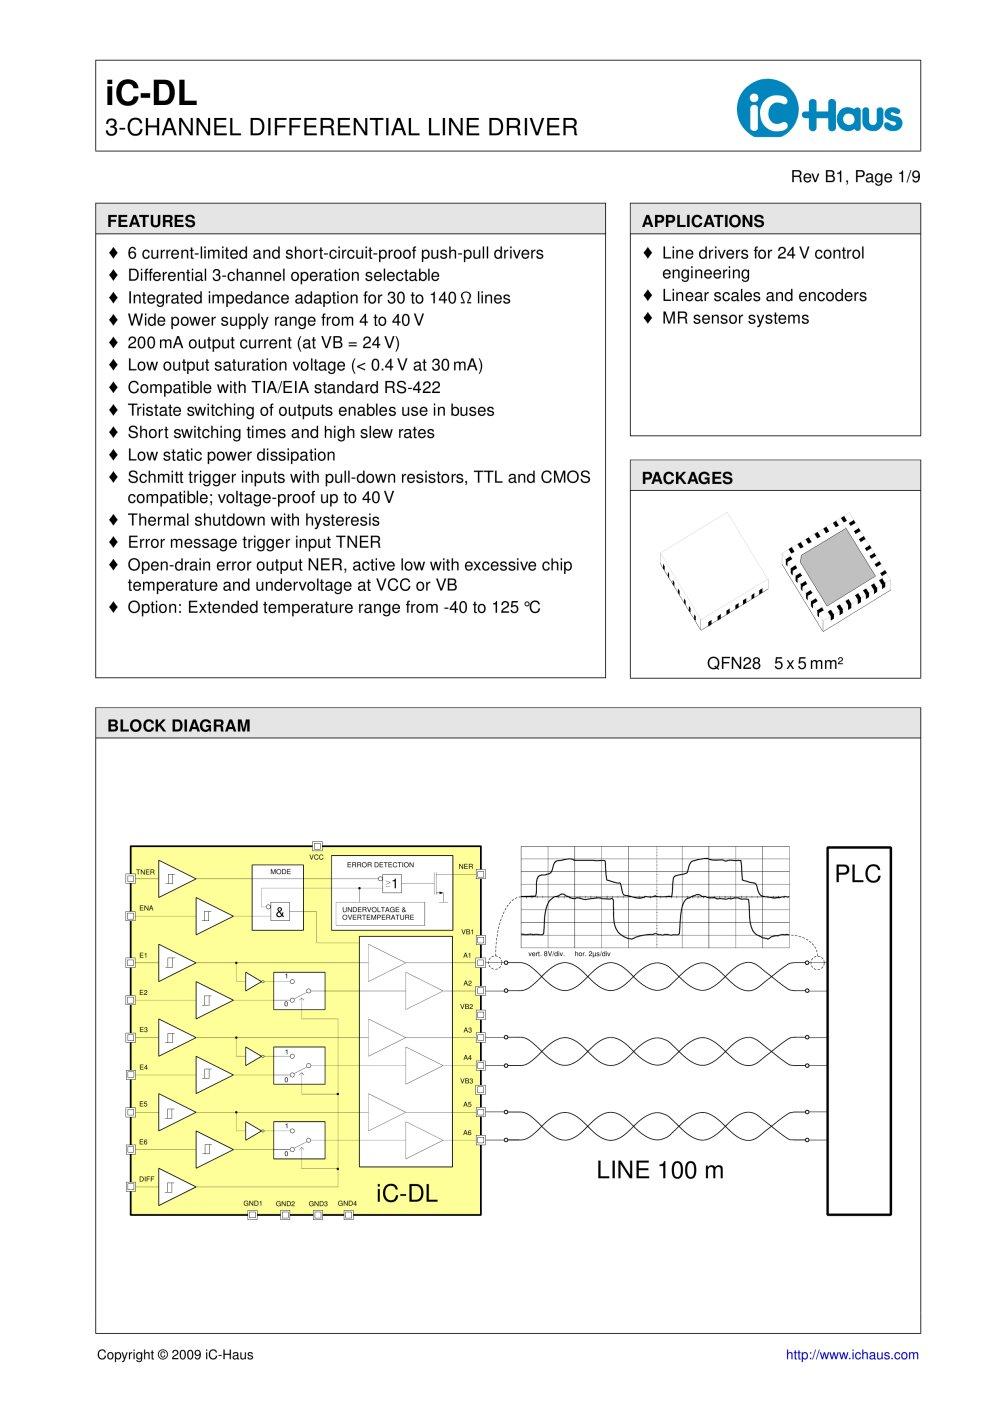 Ic Dl 3 Channel Differential Line Driver Haus Pdf Catalogue 8 Encoder Logic Diagram 1 9 Pages